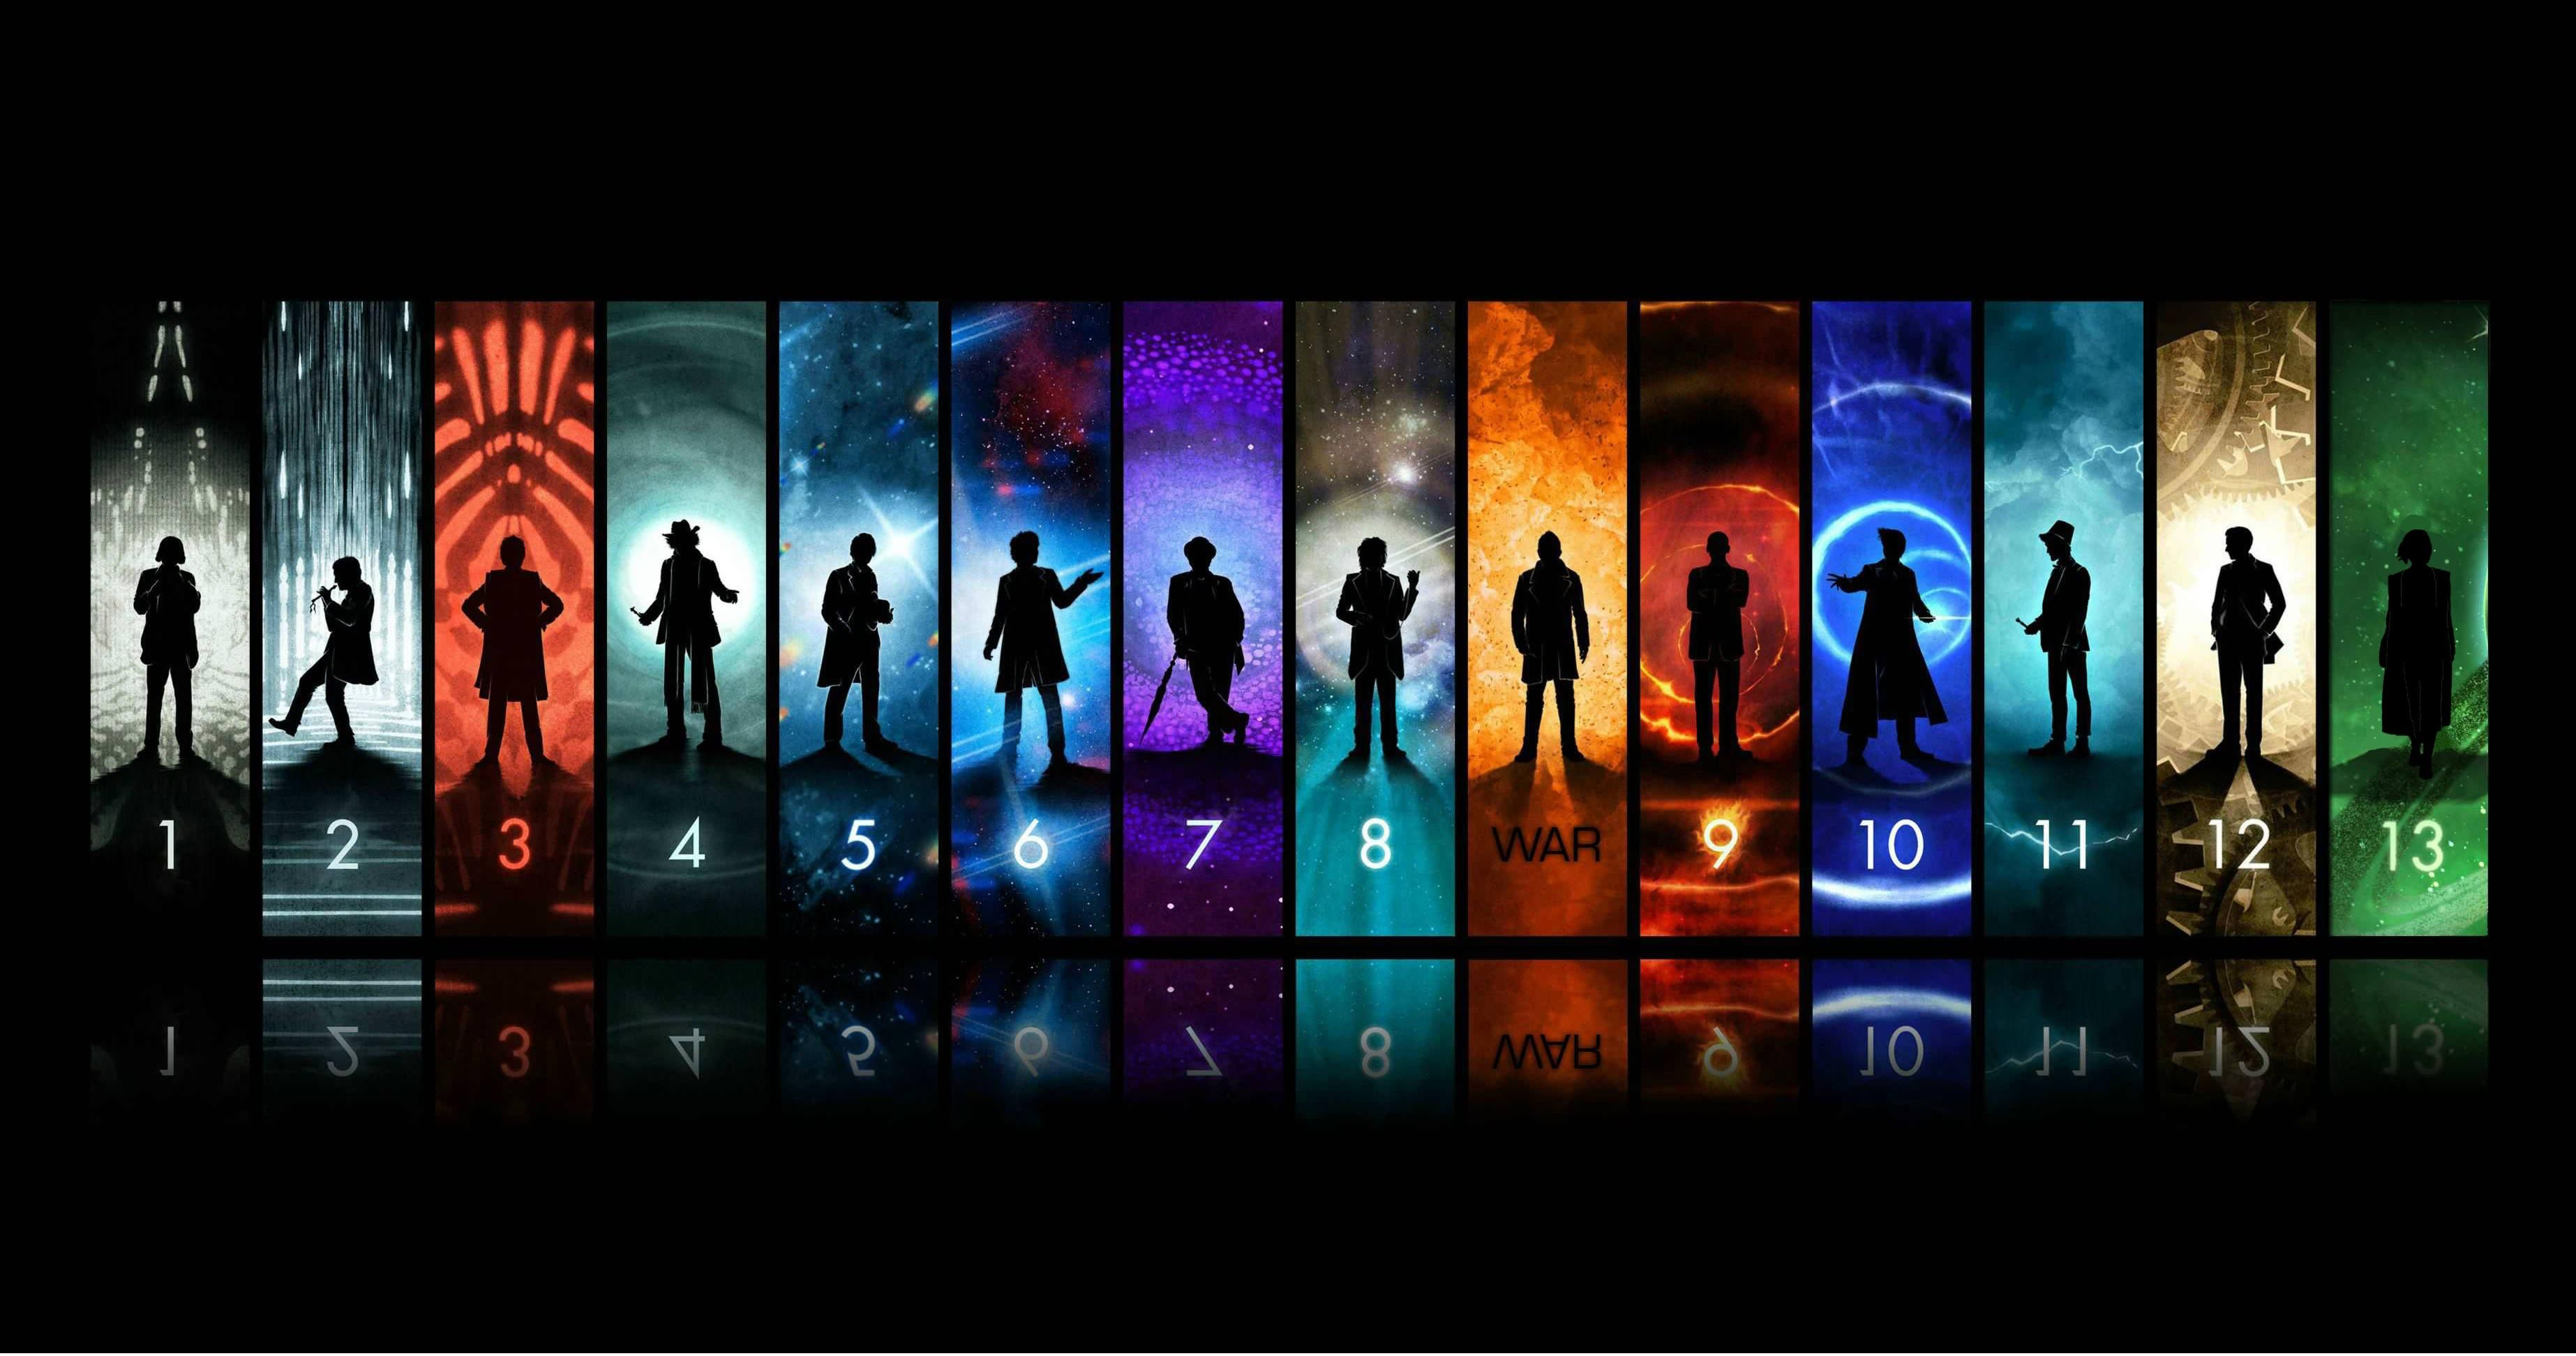 14 Doctors Wallpaper | Papel de parede doctor who, Doctor who ...